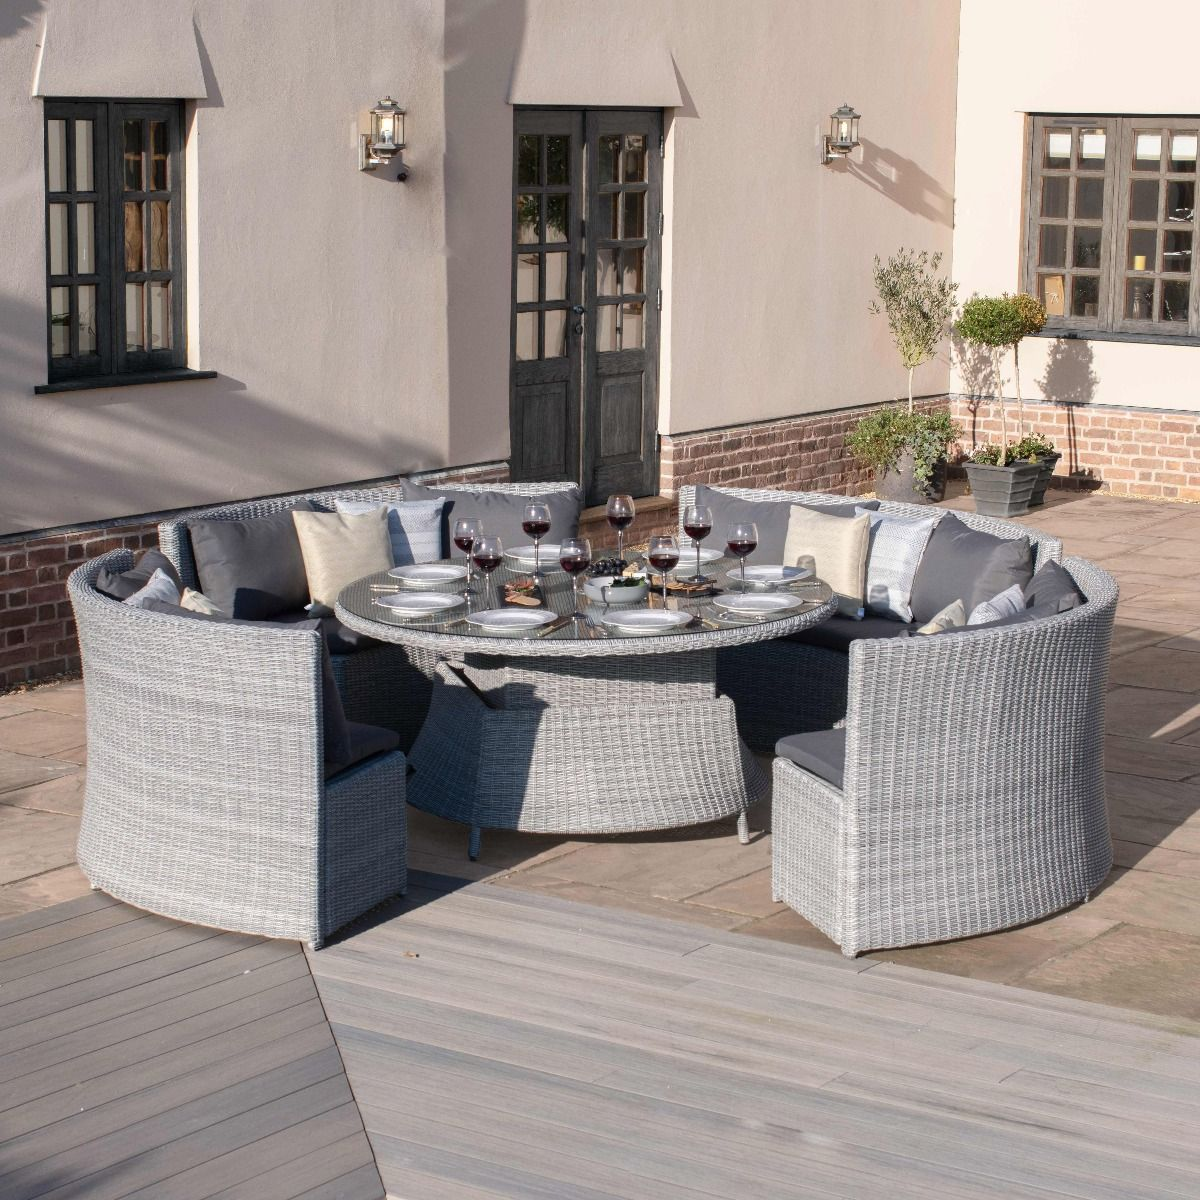 Maze Rattan Ascot Sofa Dining Set With Rising Table Rattan Garden Furniture Round Dining Set Corner Dining Set [ 1200 x 1200 Pixel ]